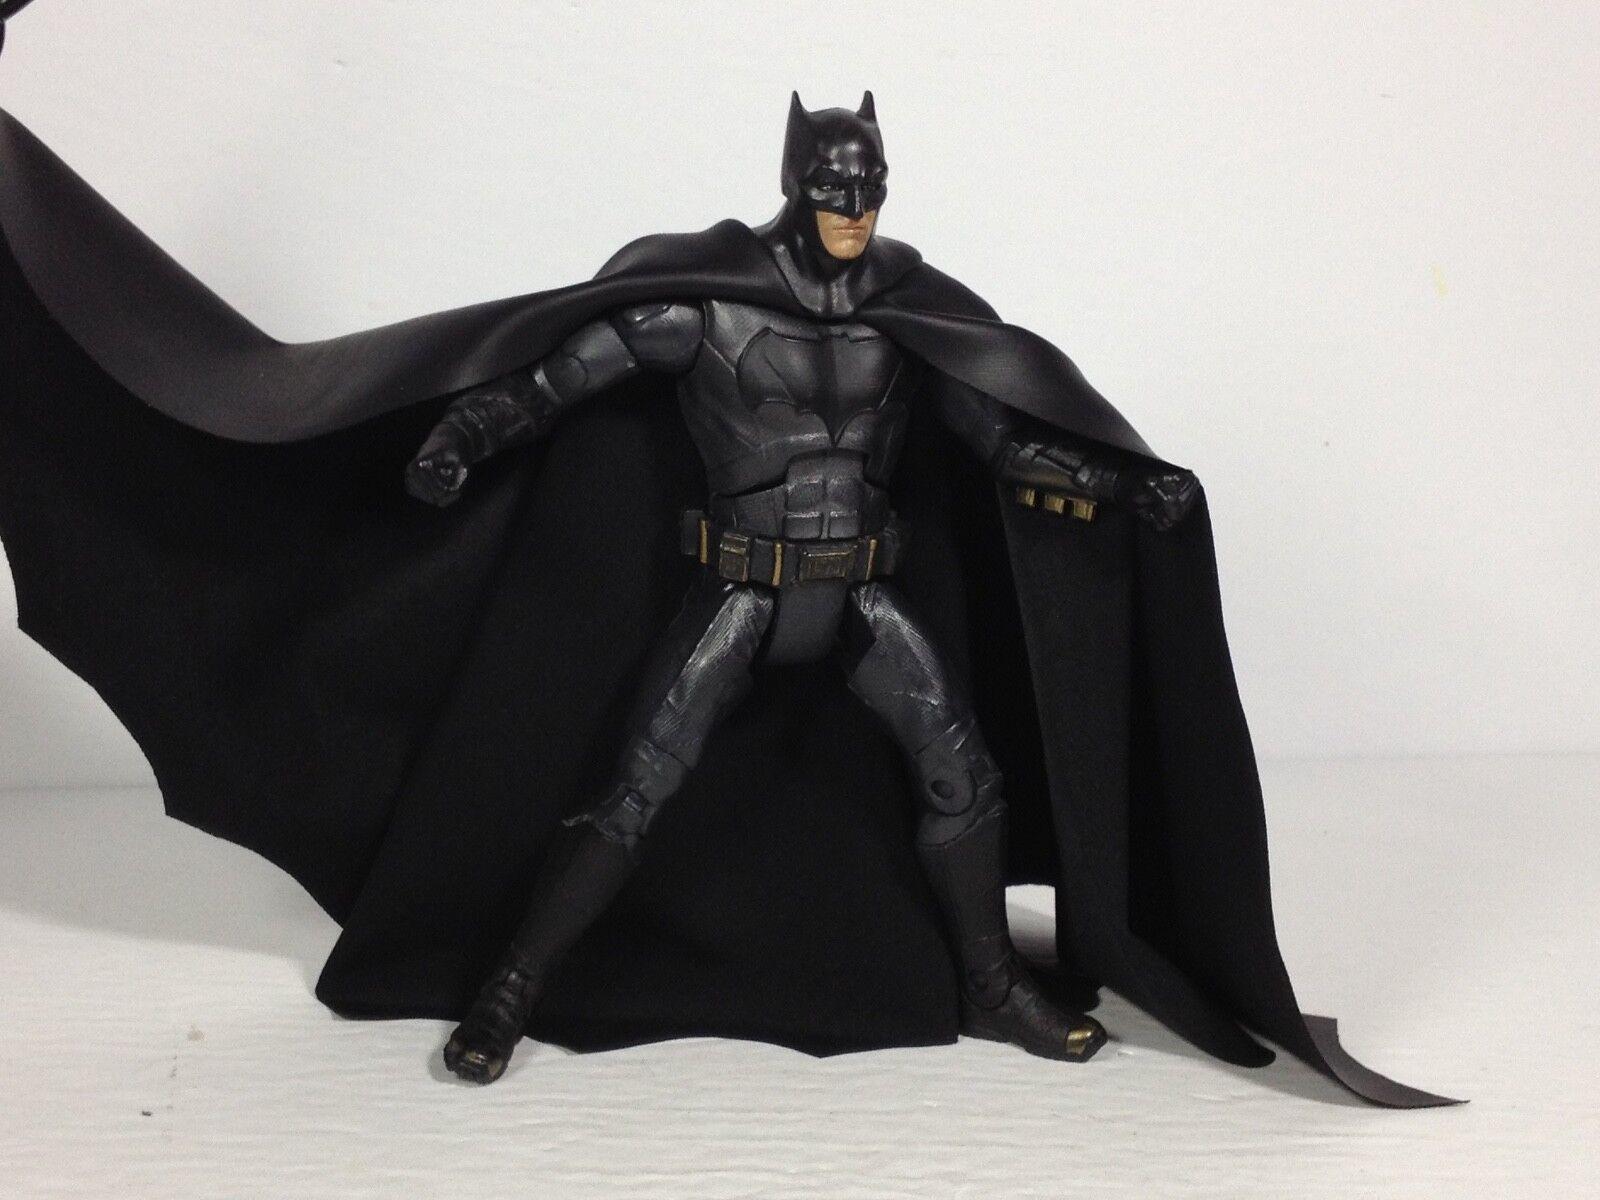 4 S.H.F Custom Capes for Batman Regular Suit